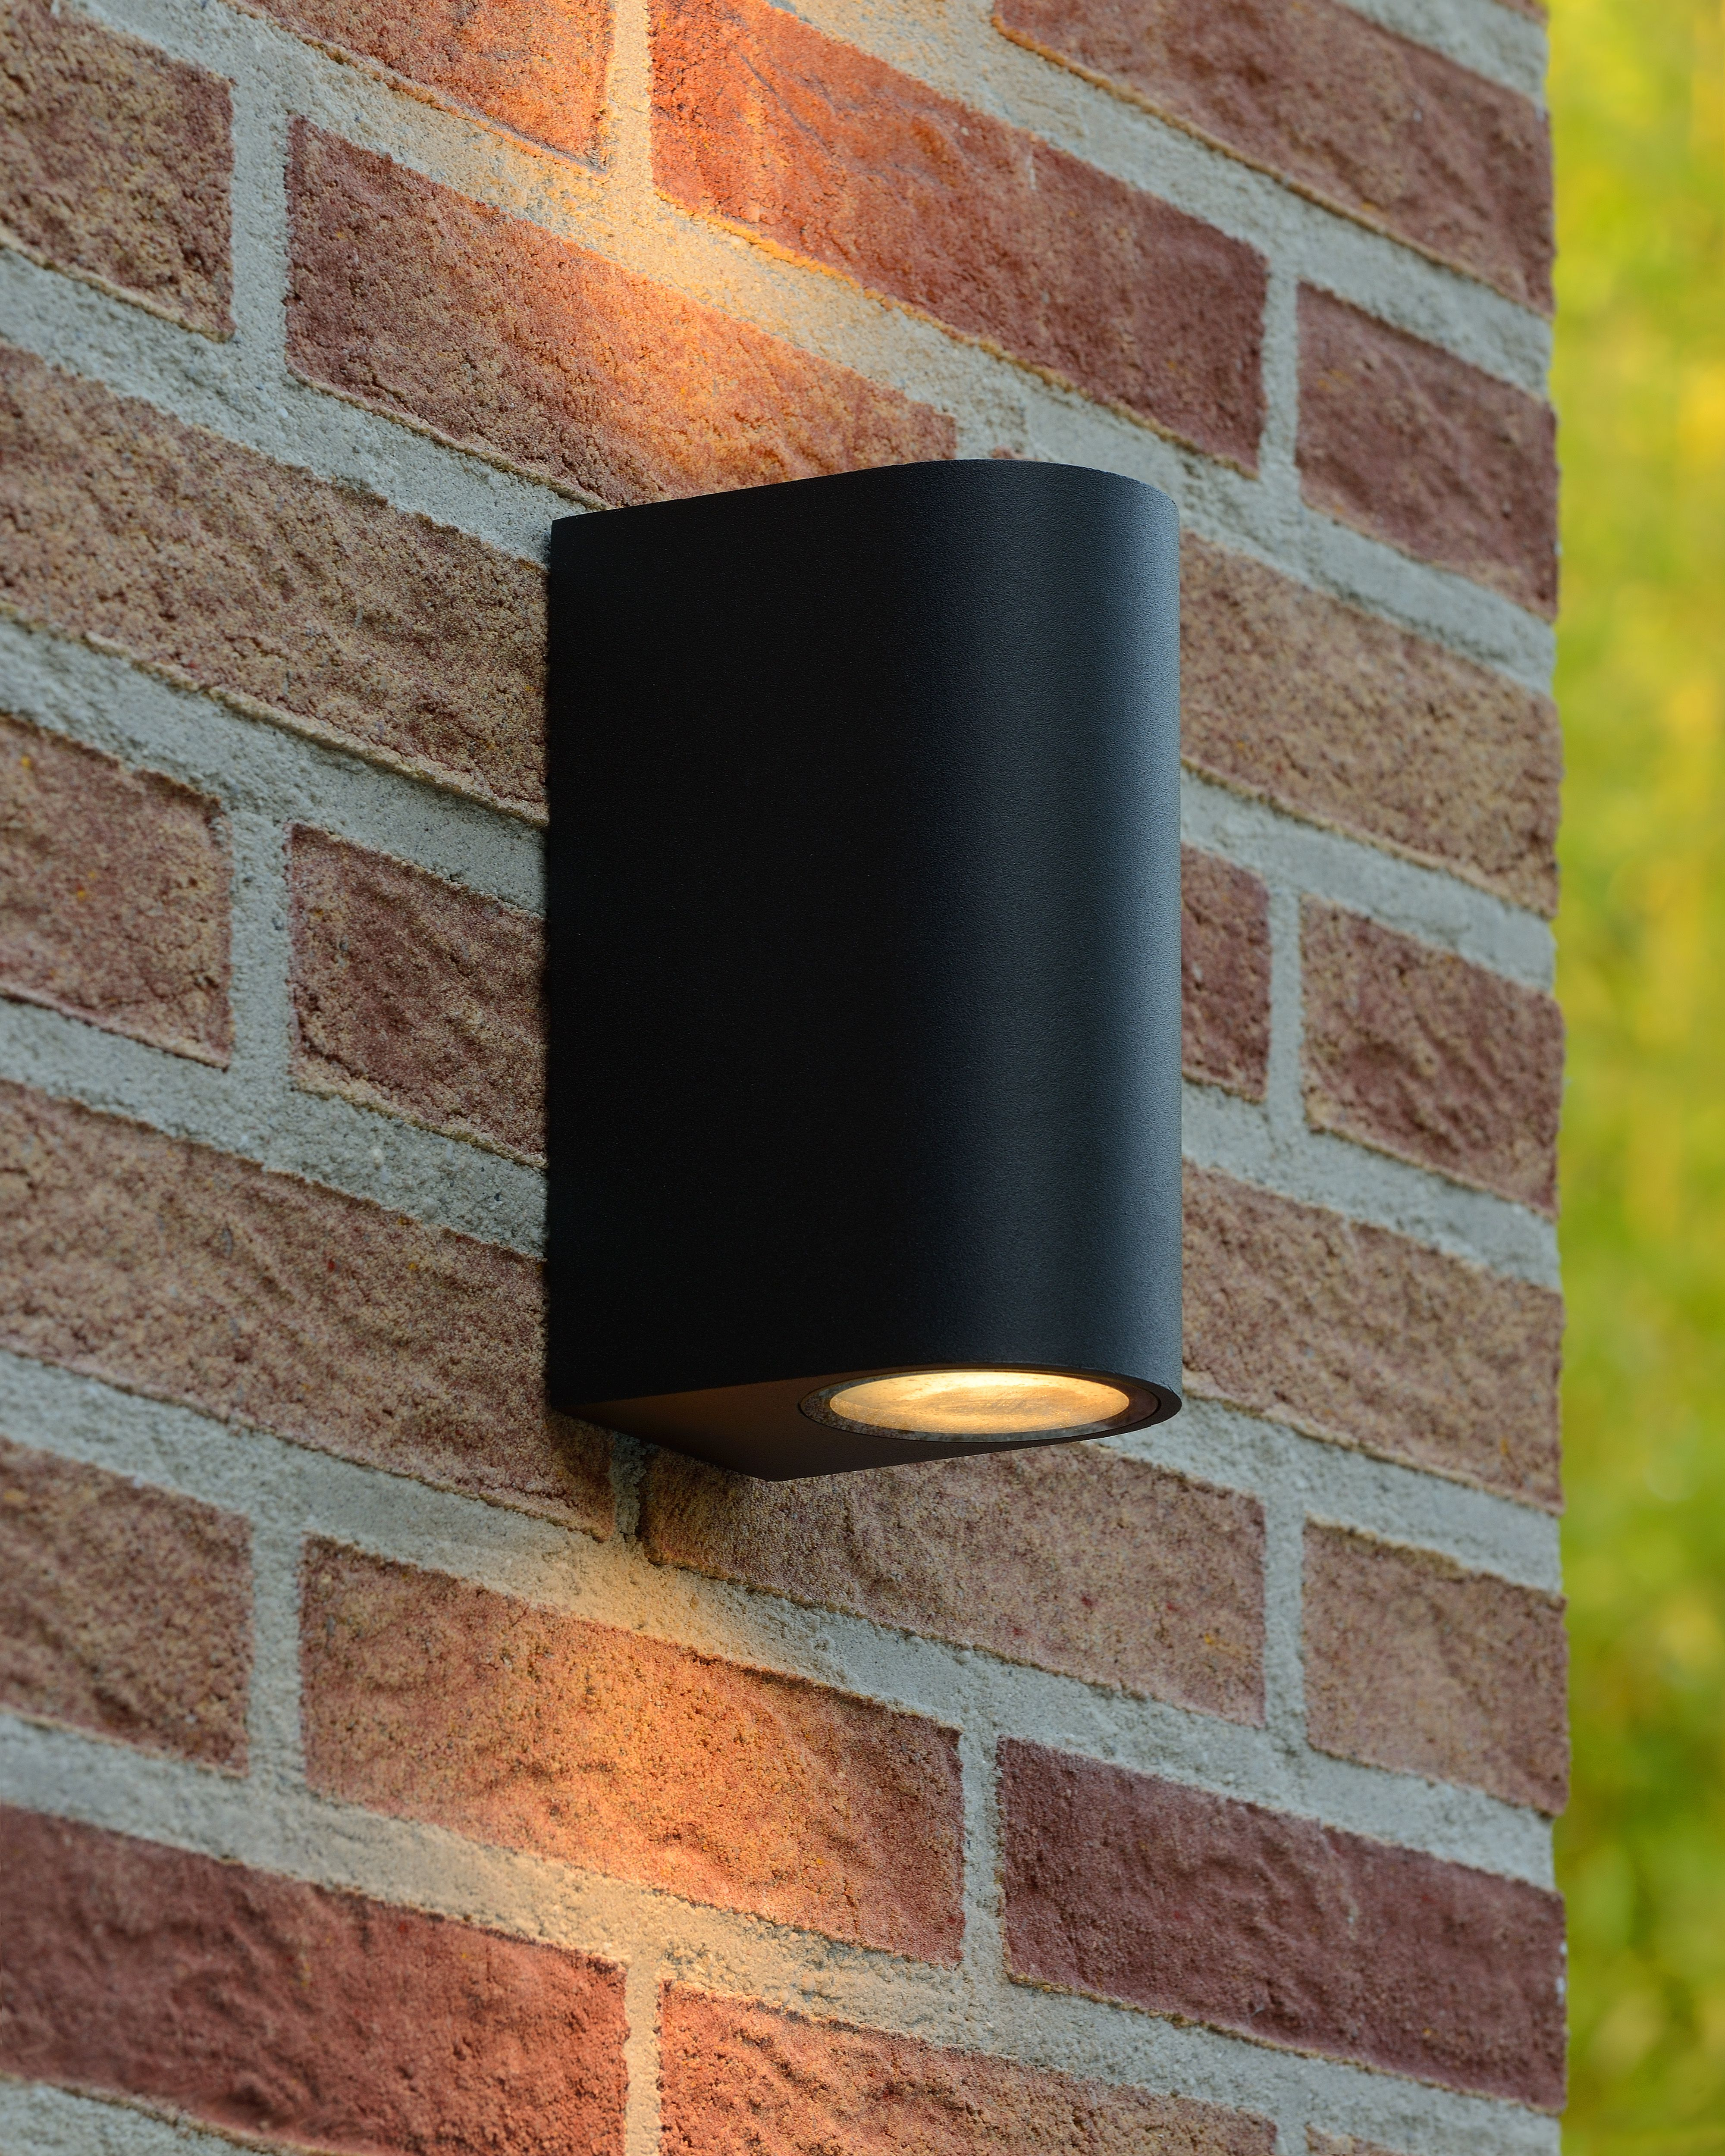 Lucide Zora Led Wall Spotlight Outdoor Led Dim Gu10 2x5w 3000k Ip44 Black Wandlamp Wandverlichting Muurverlichting